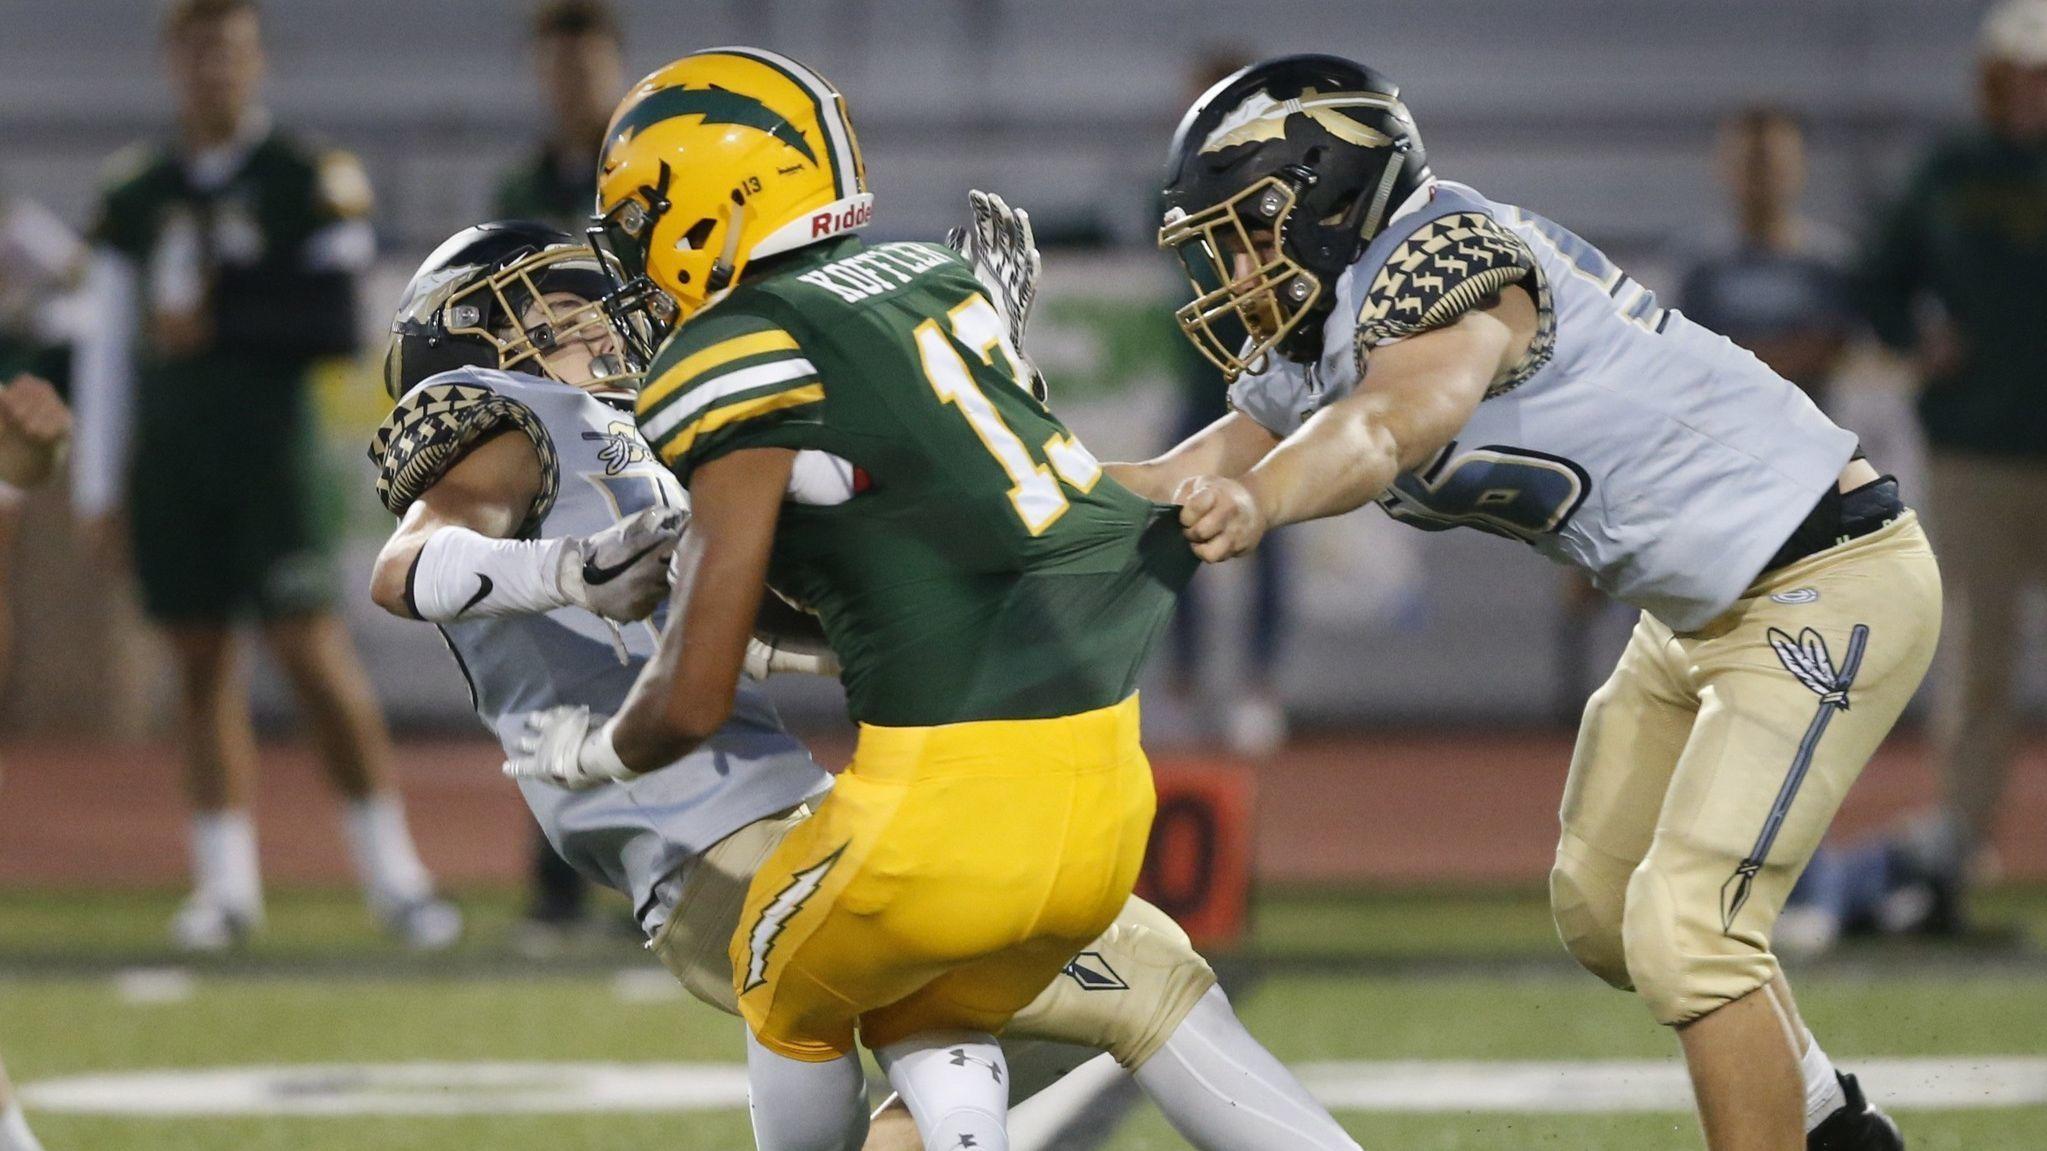 Week 3 High School Football Preview: Edison vs. San Juan Hills